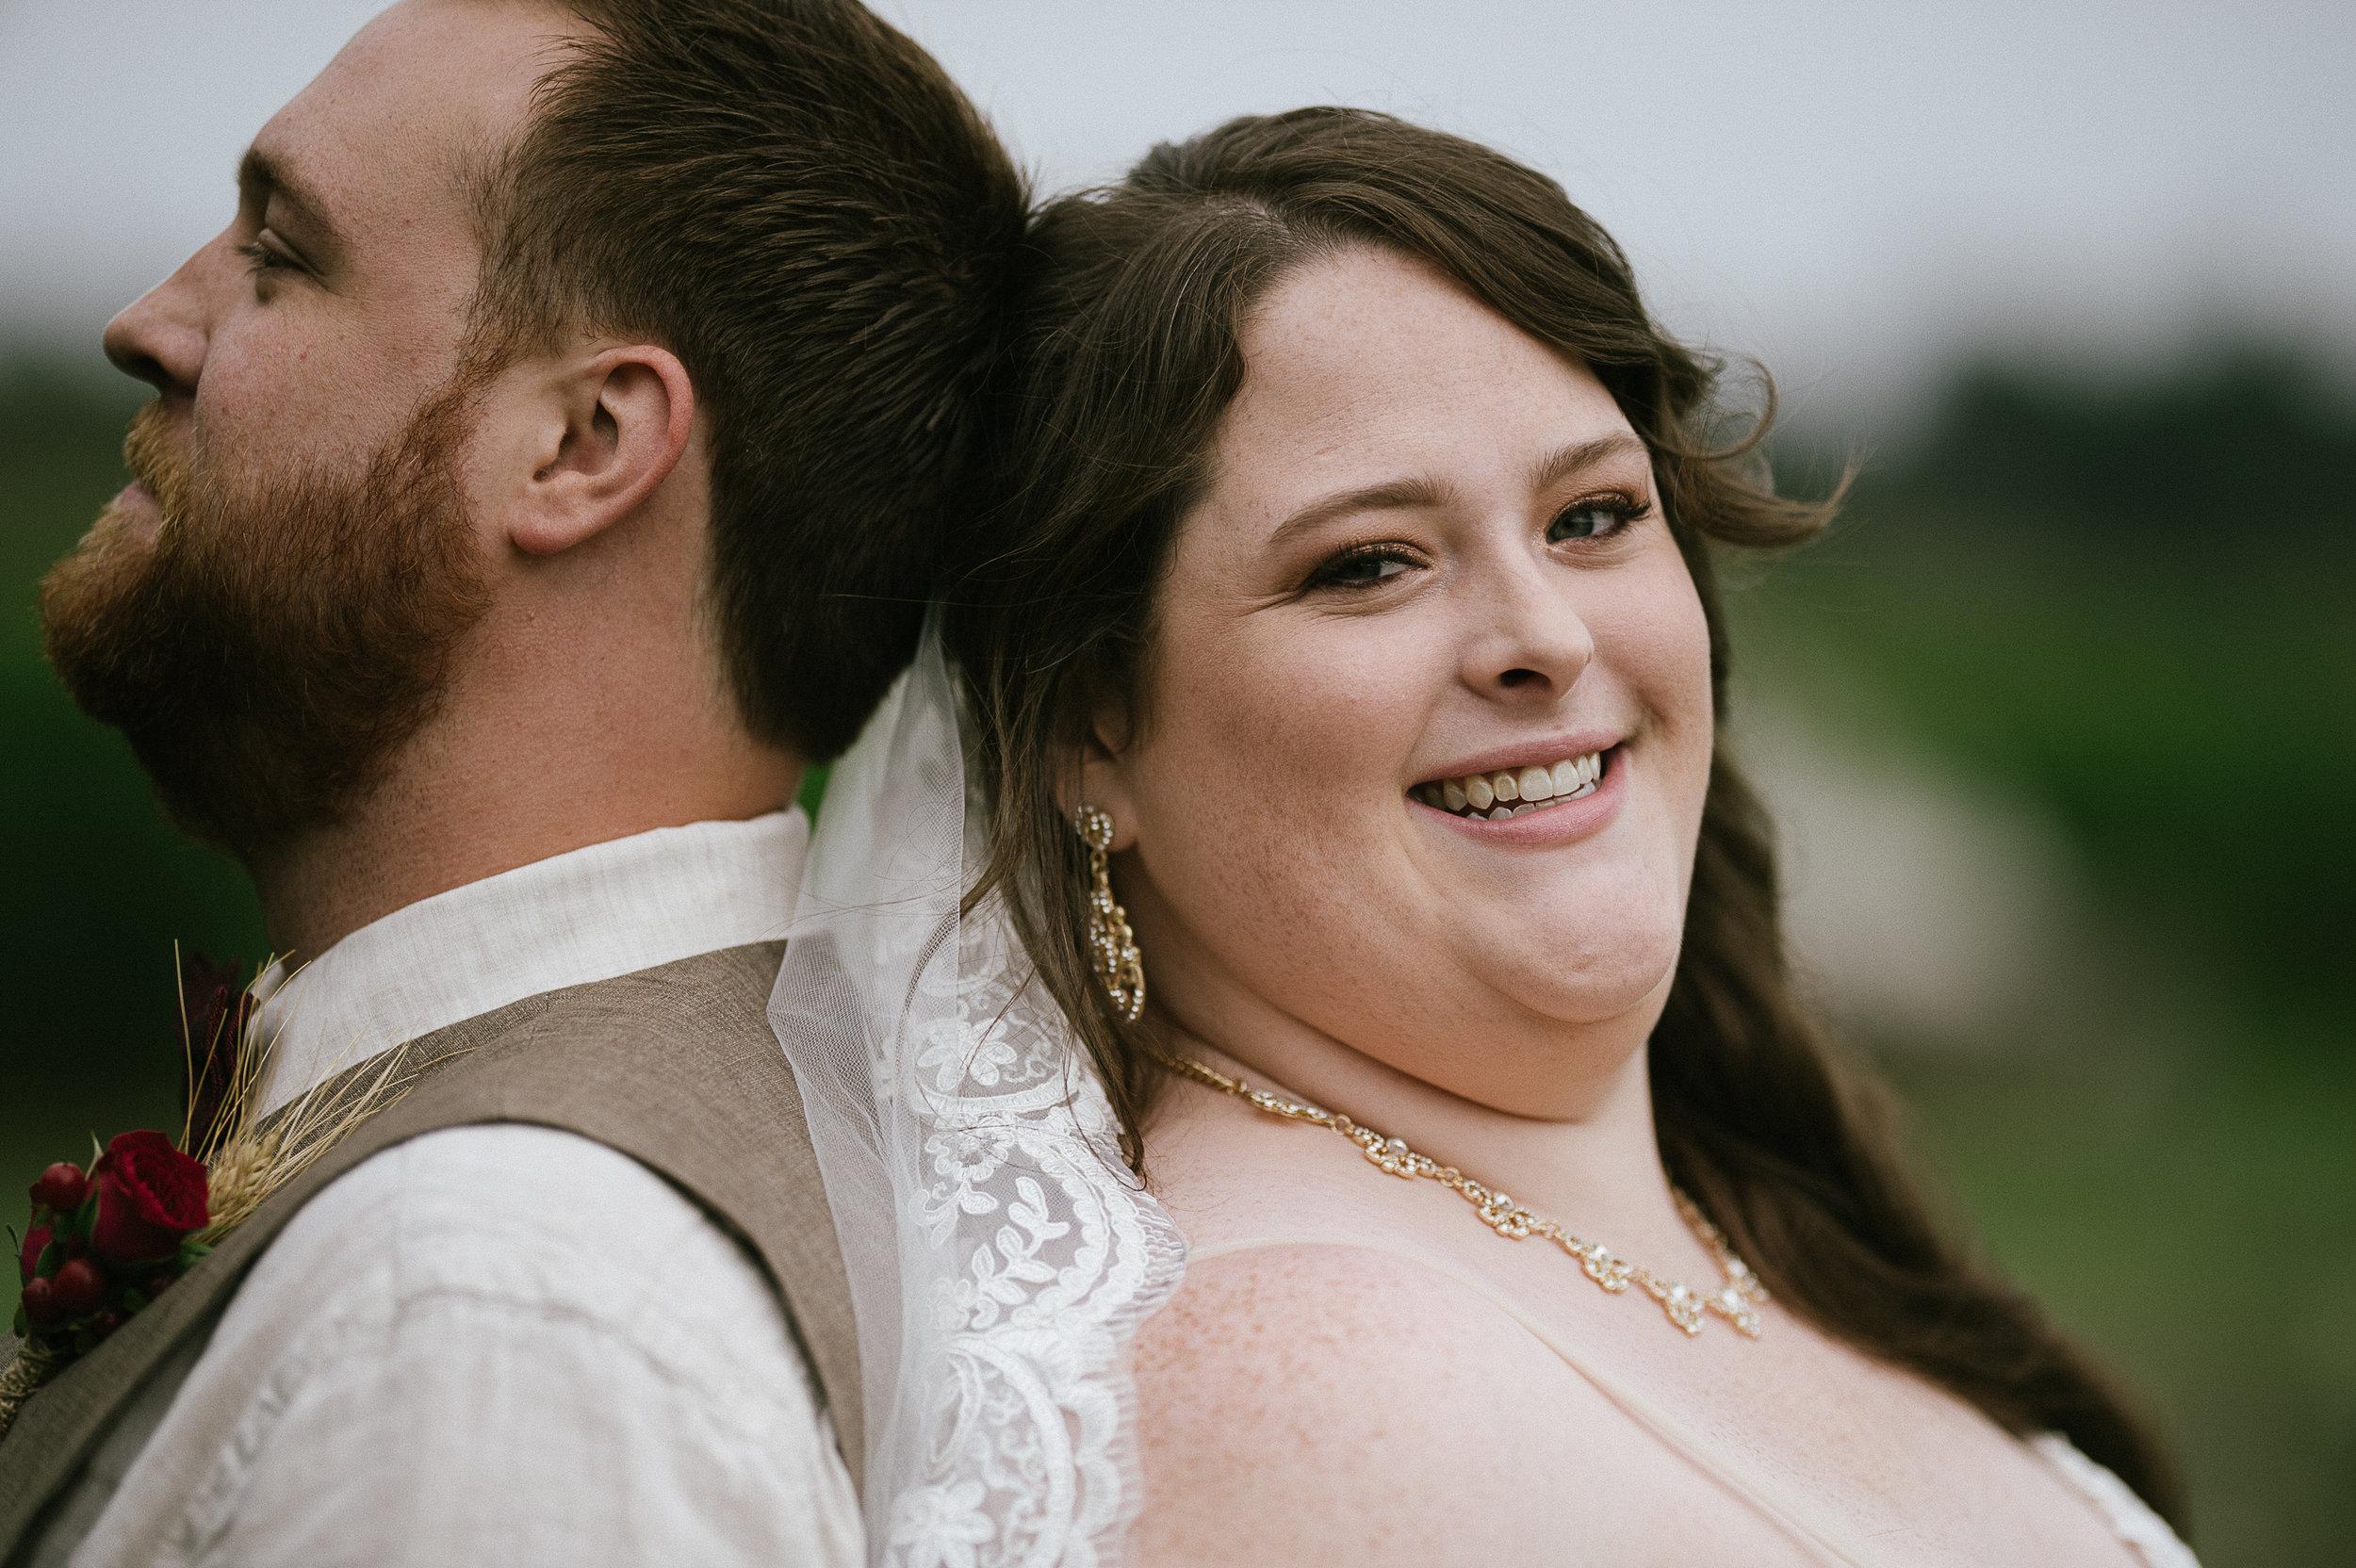 Swan Trail Farm Wedding_Sarah Schurman + Brian Skadan_Snohomish Wedding_Kelsey Lane Photography-5772.jpg